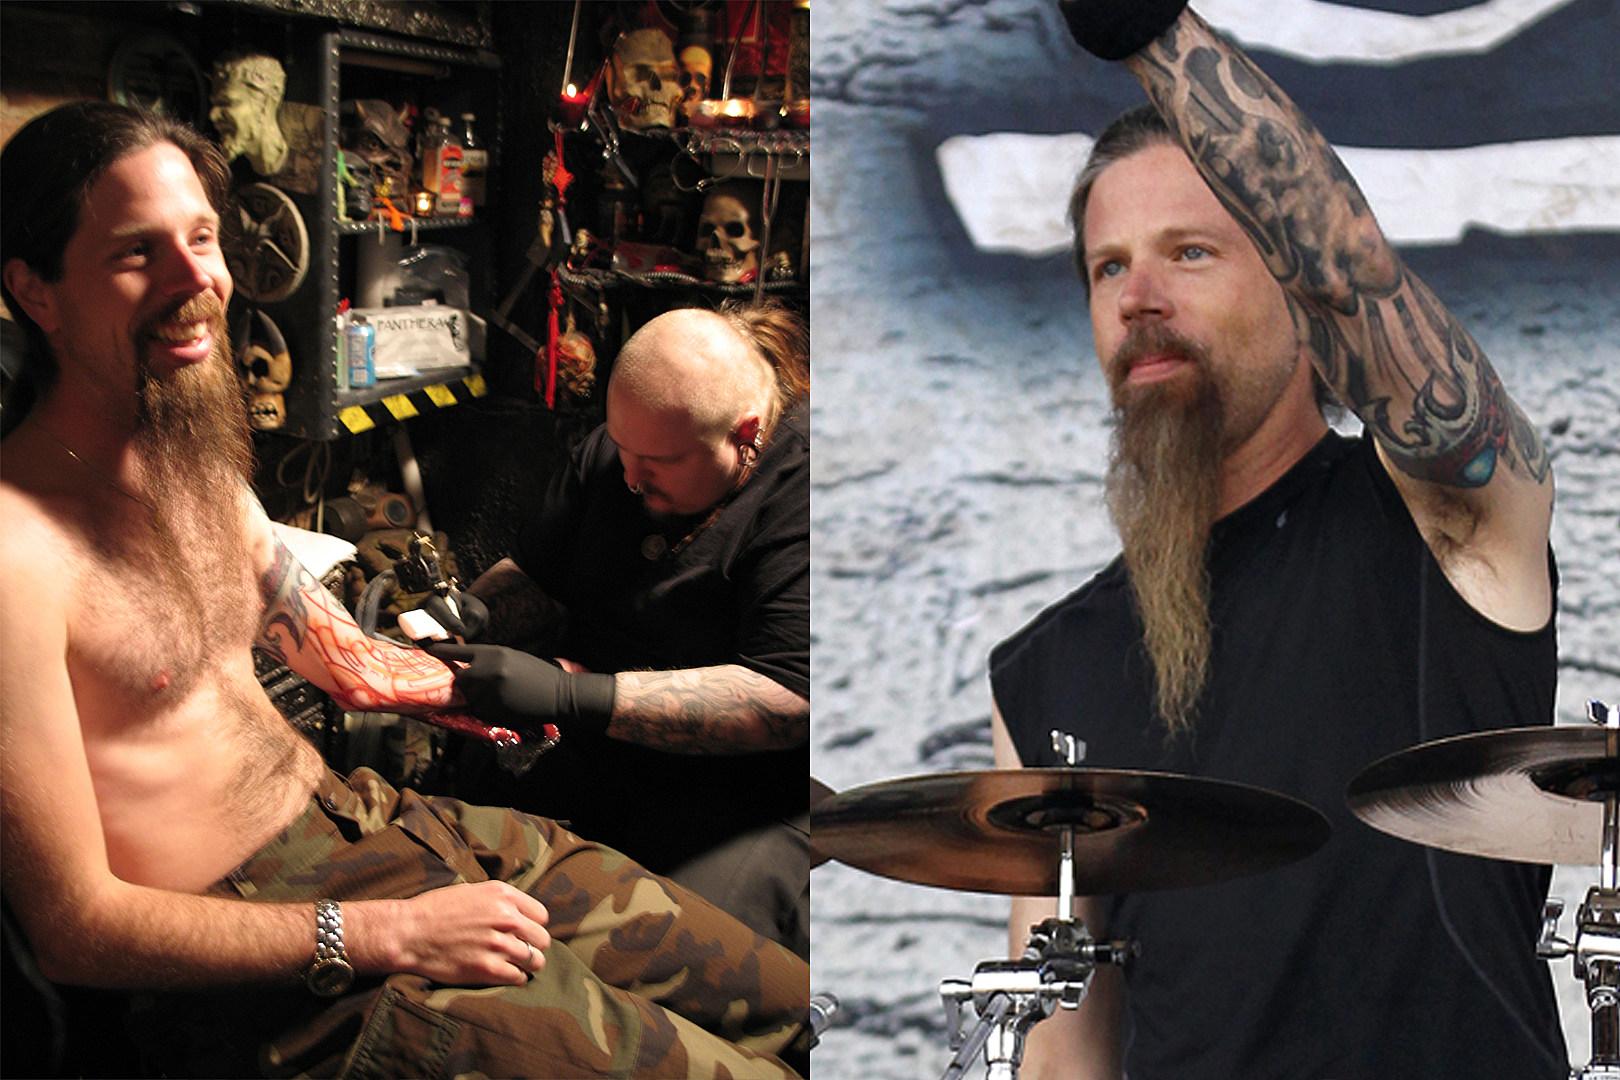 Lamb of God: Chris Adler's Tattoos Can't Be Described